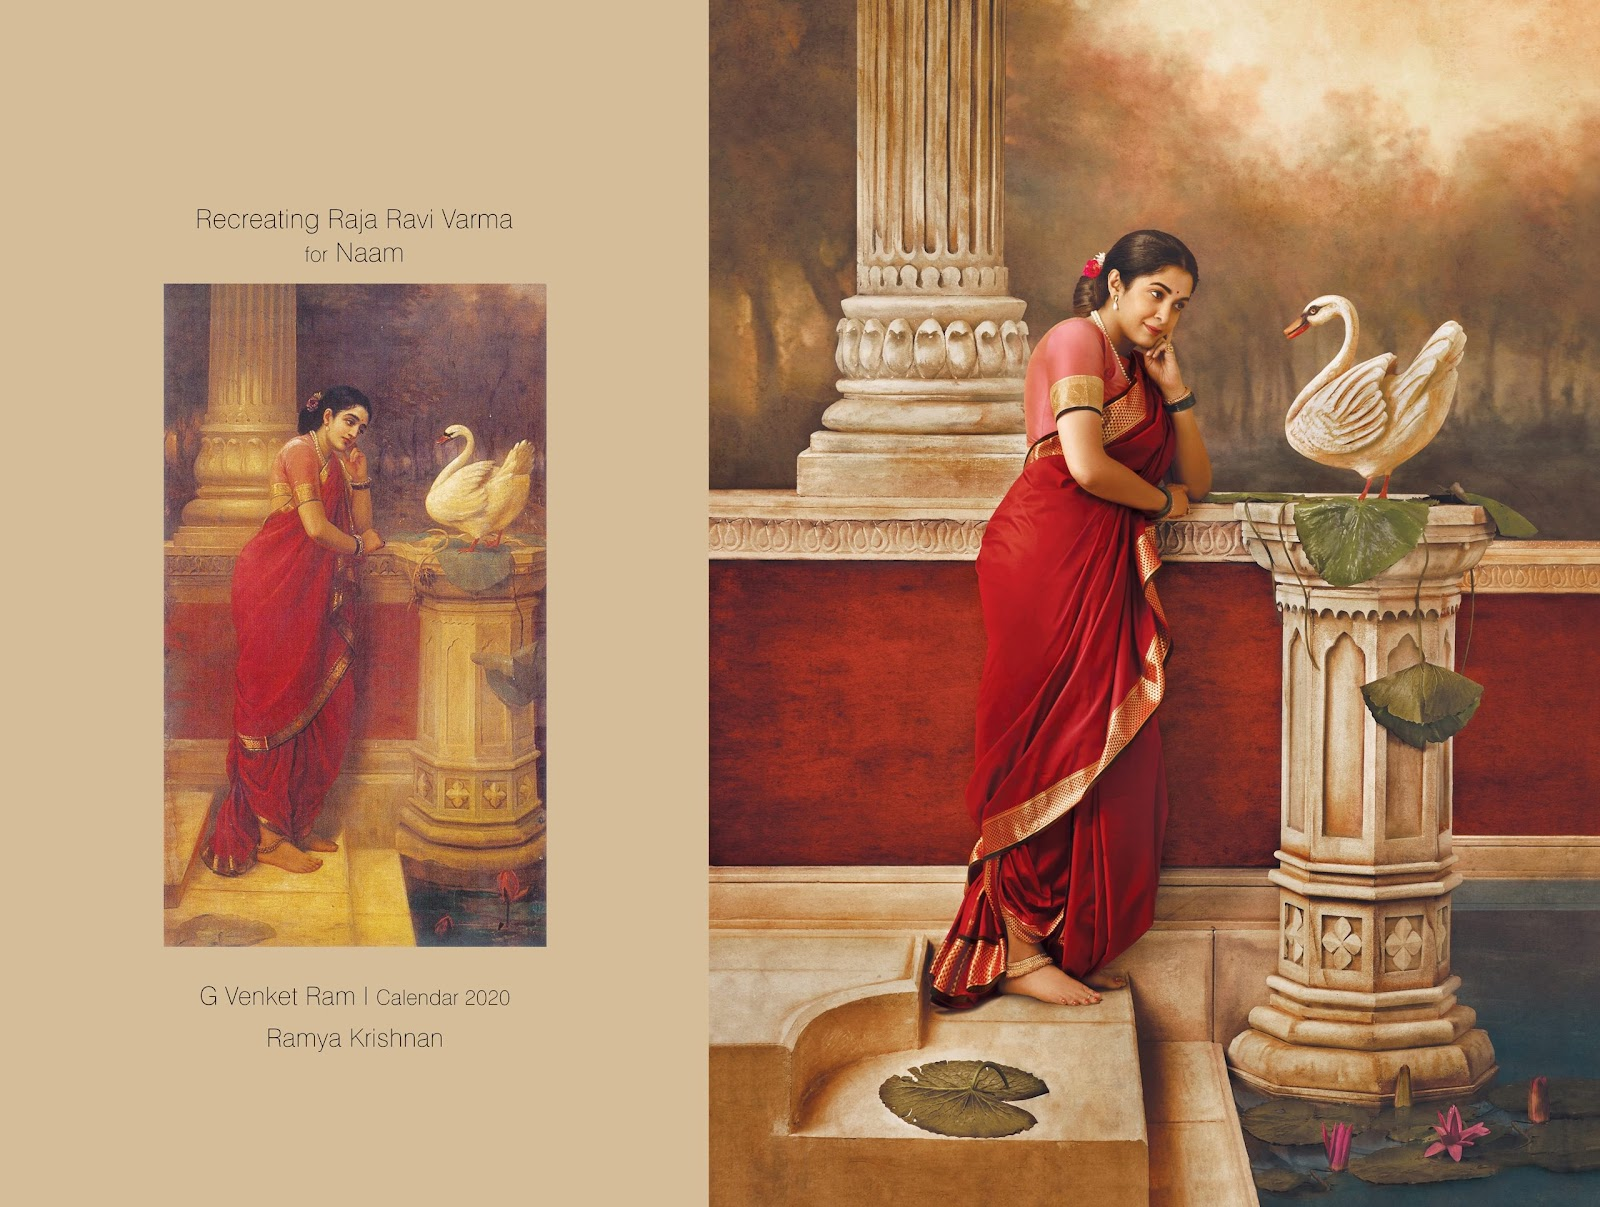 South Indian Actresses Portrait Raja Ravi Varma's Painting in G Venket Ram's Calendar 2020 Navel Queens